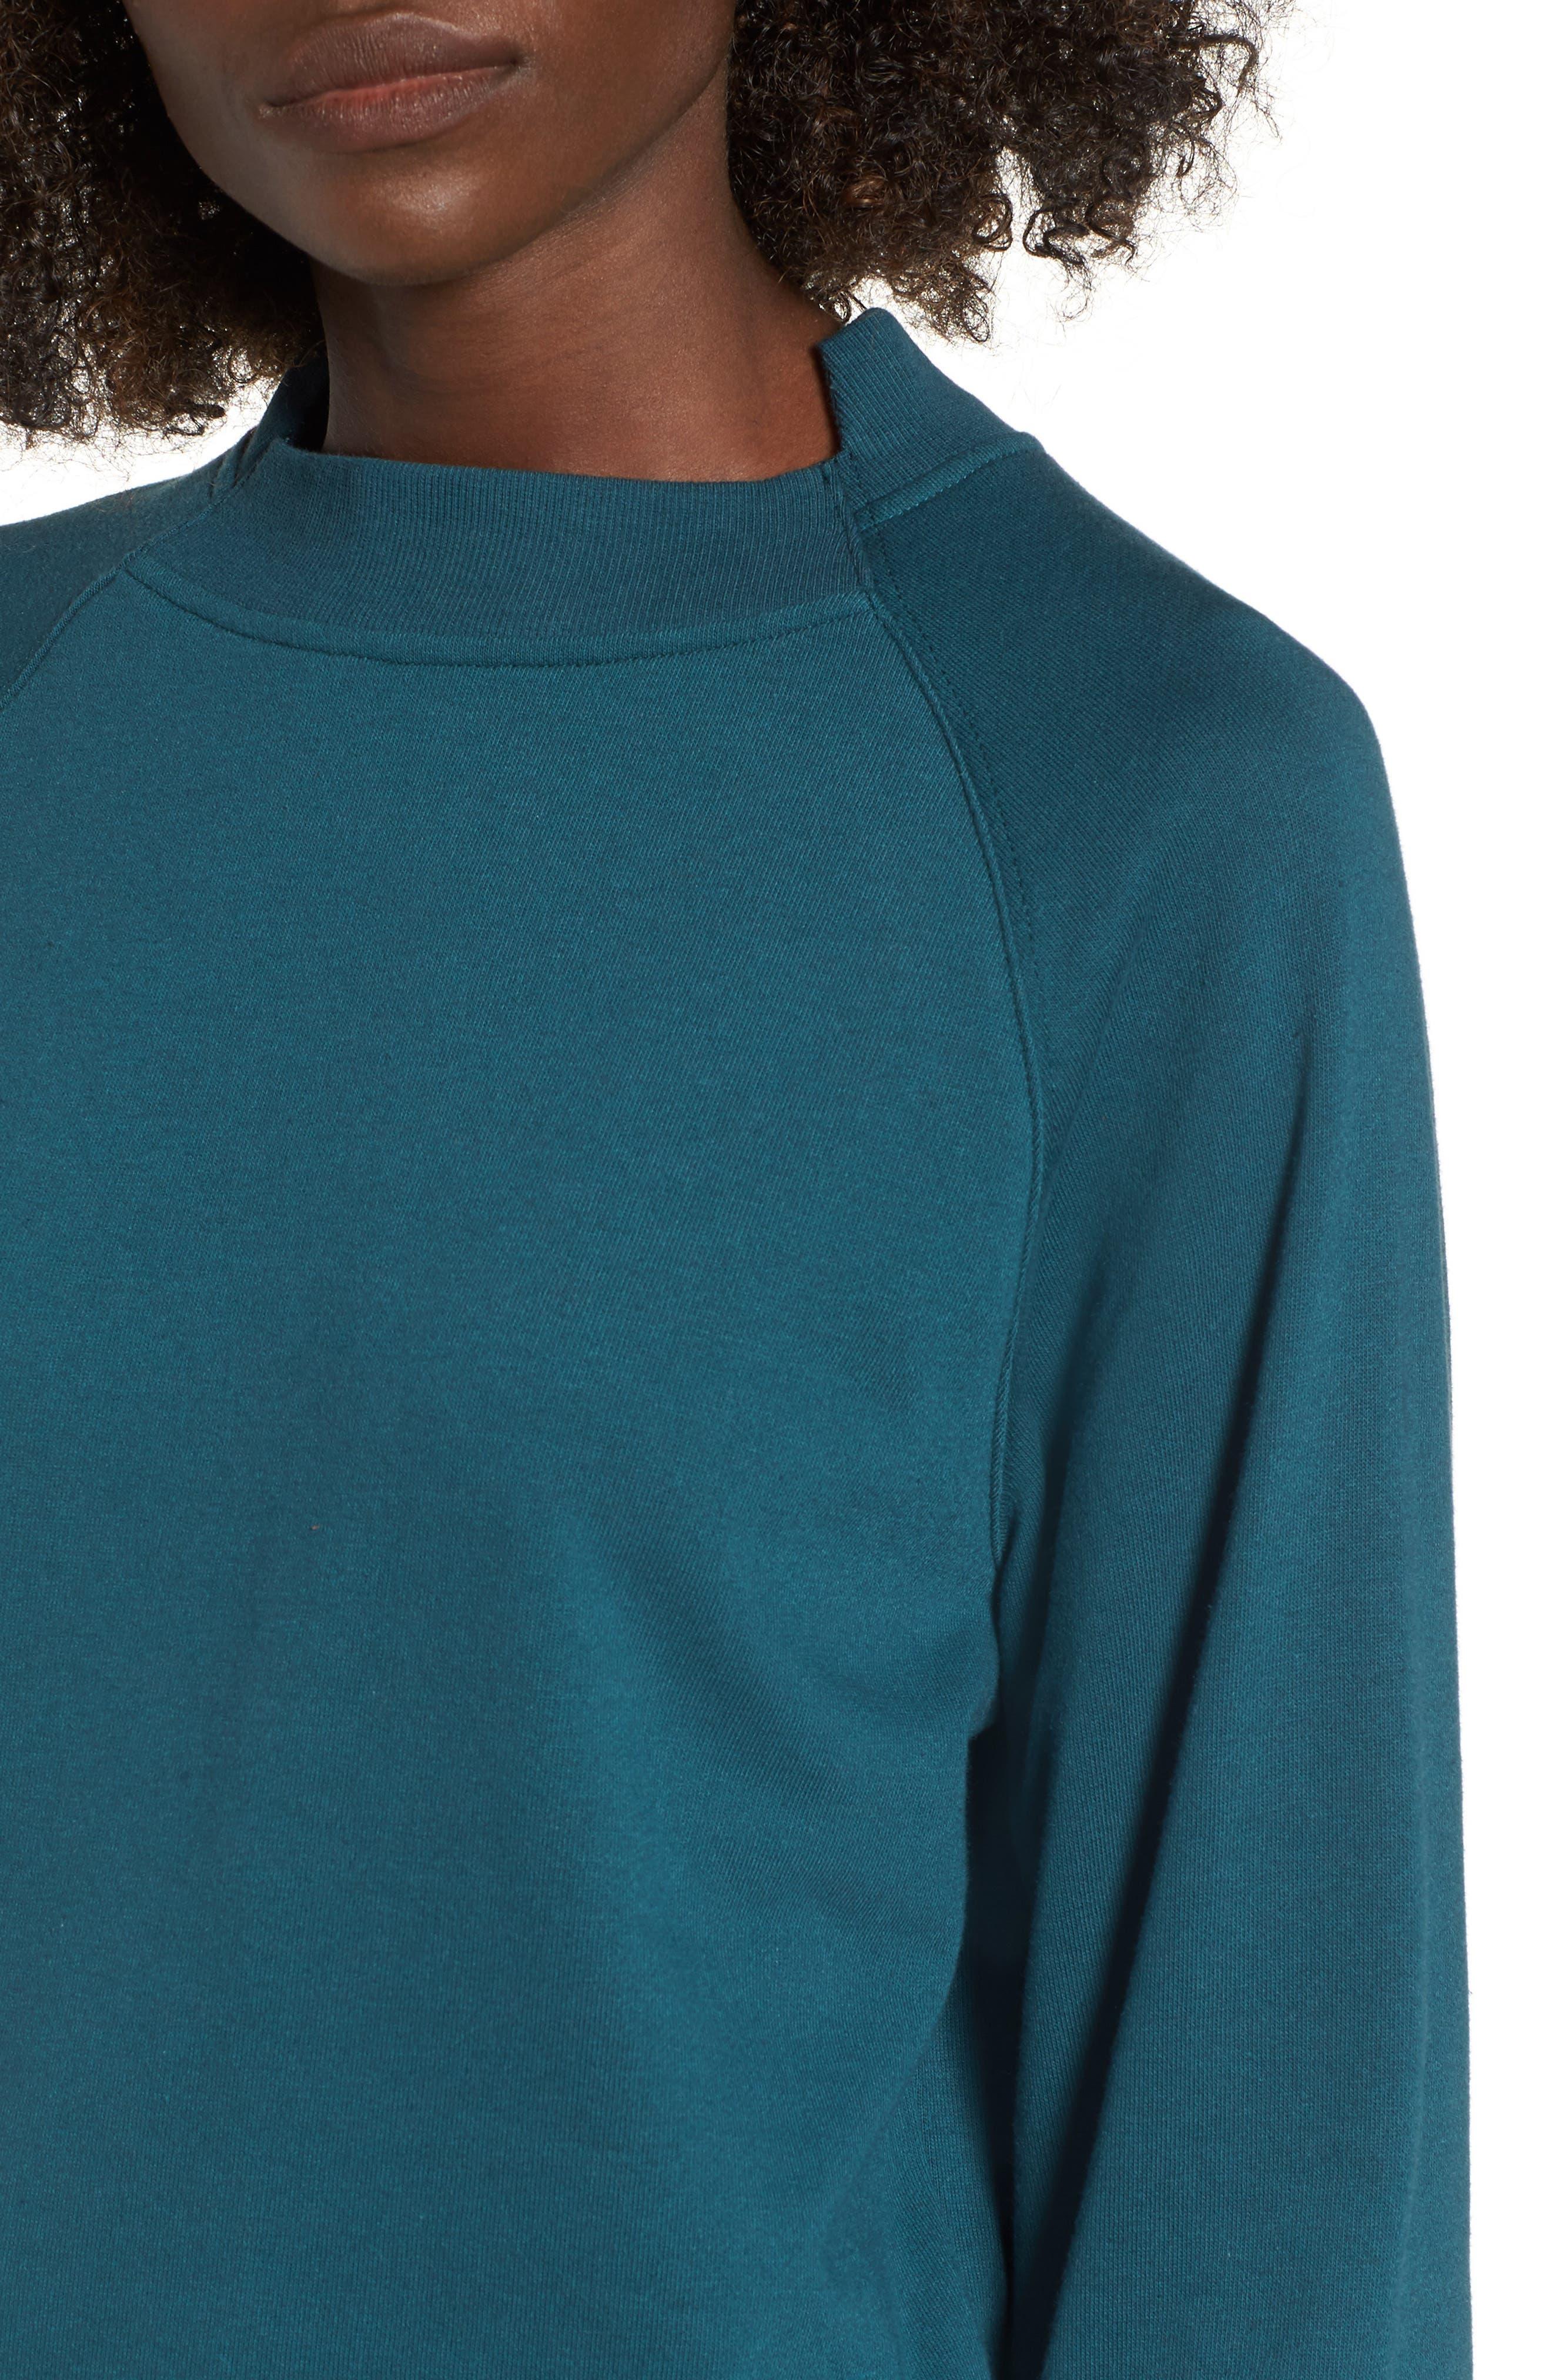 Cinched Sleeve Sweatshirt,                             Alternate thumbnail 4, color,                             Teal